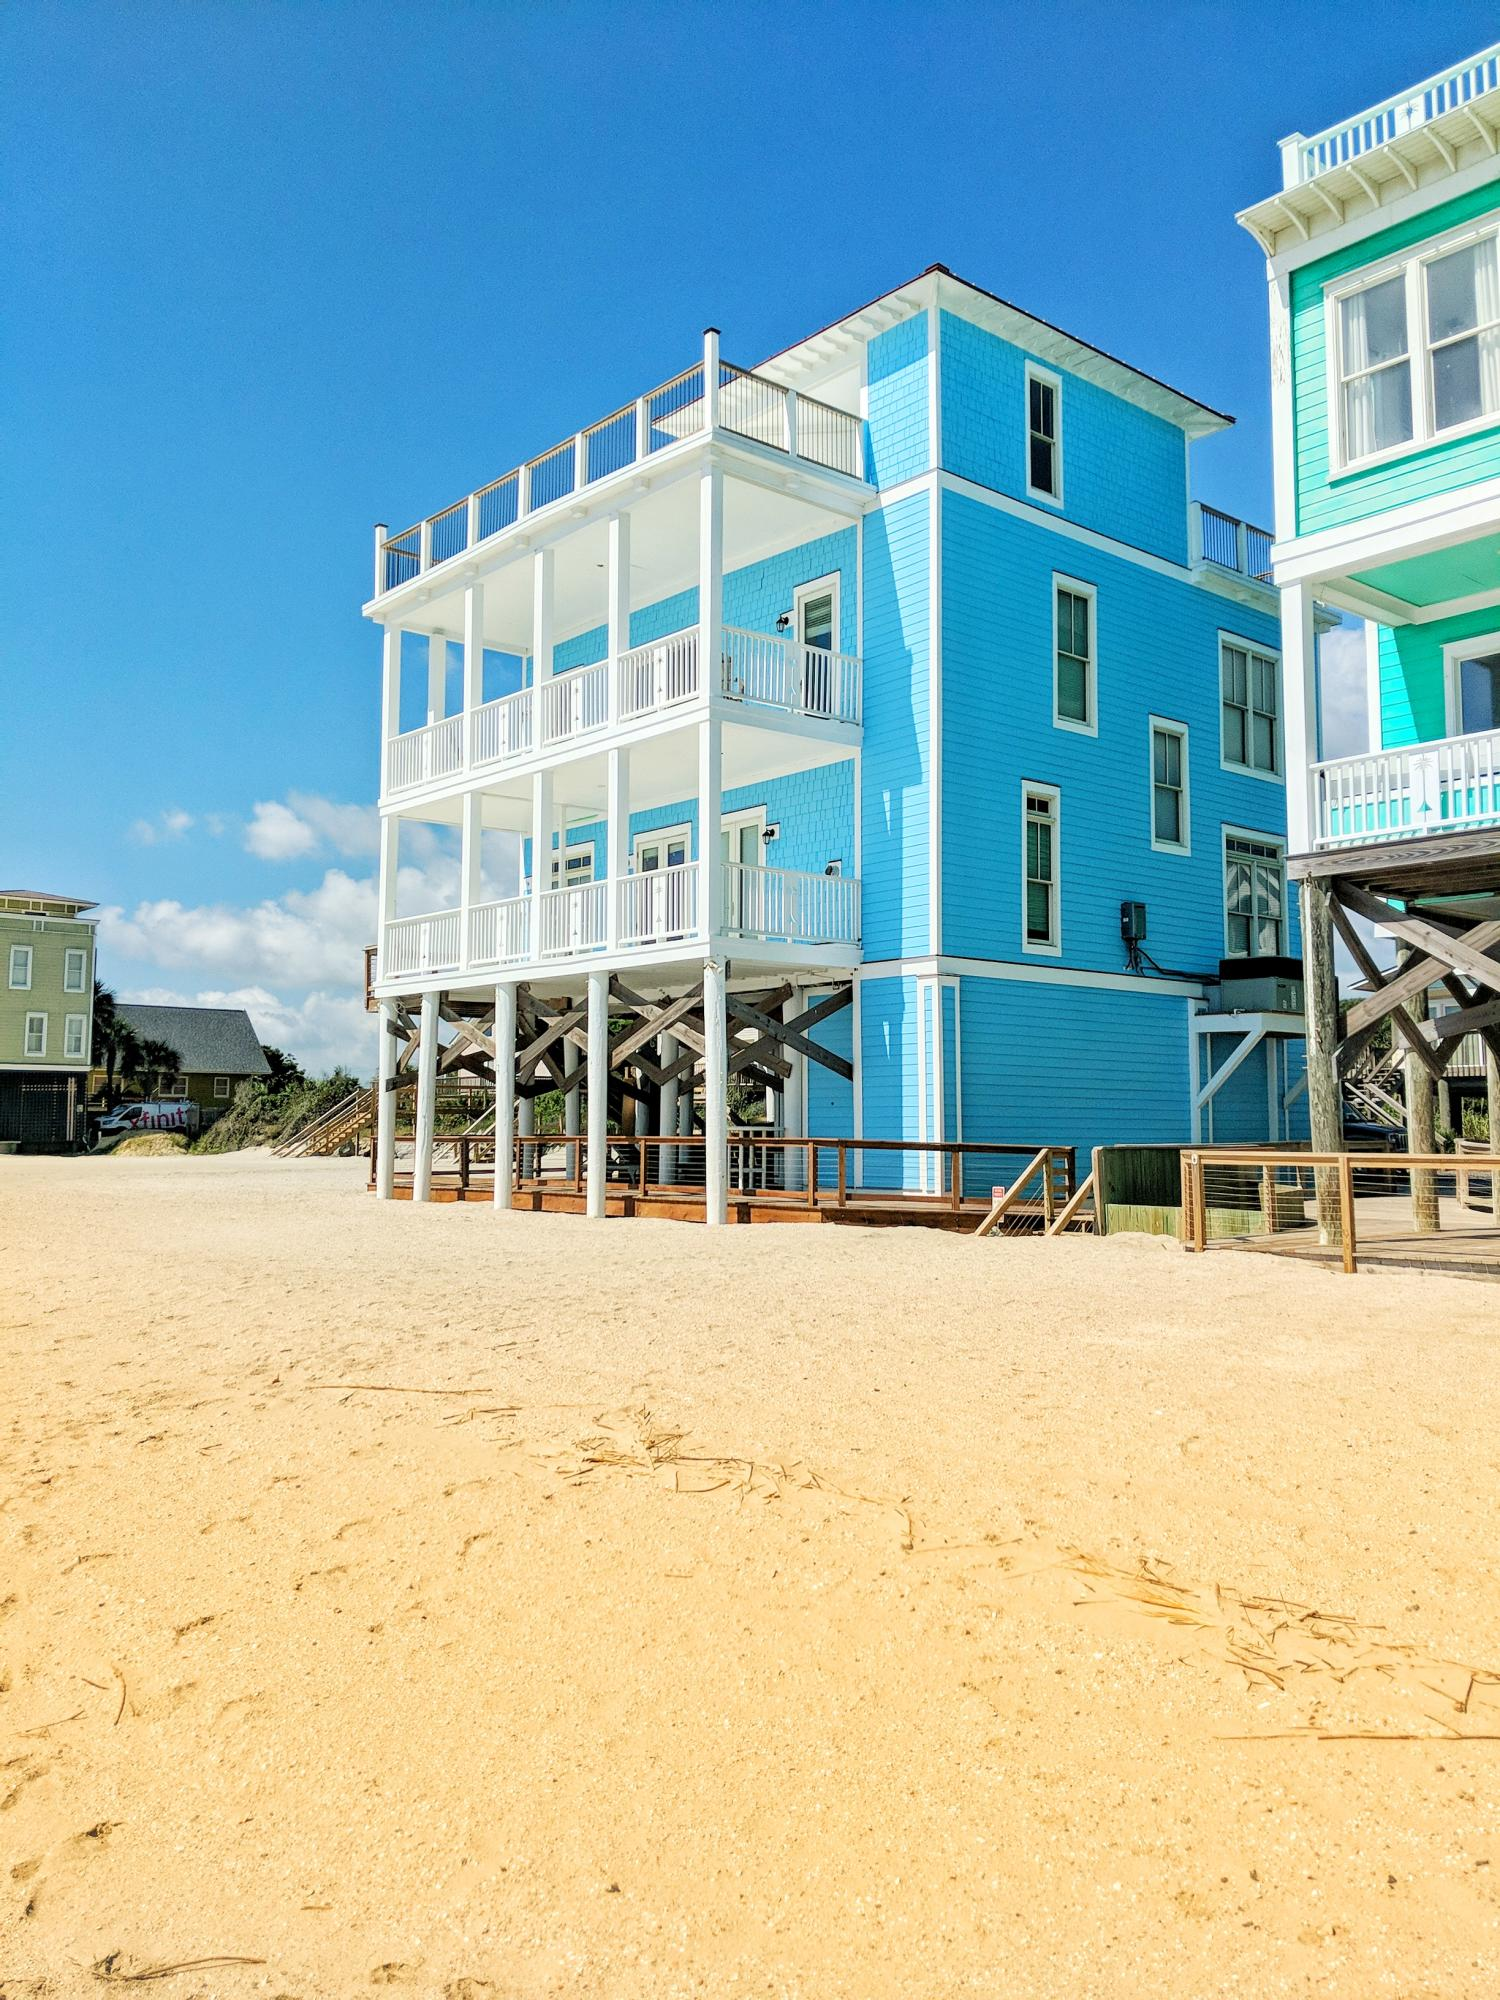 1707 B E Ashley Ave Drive Folly Beach, SC 29439